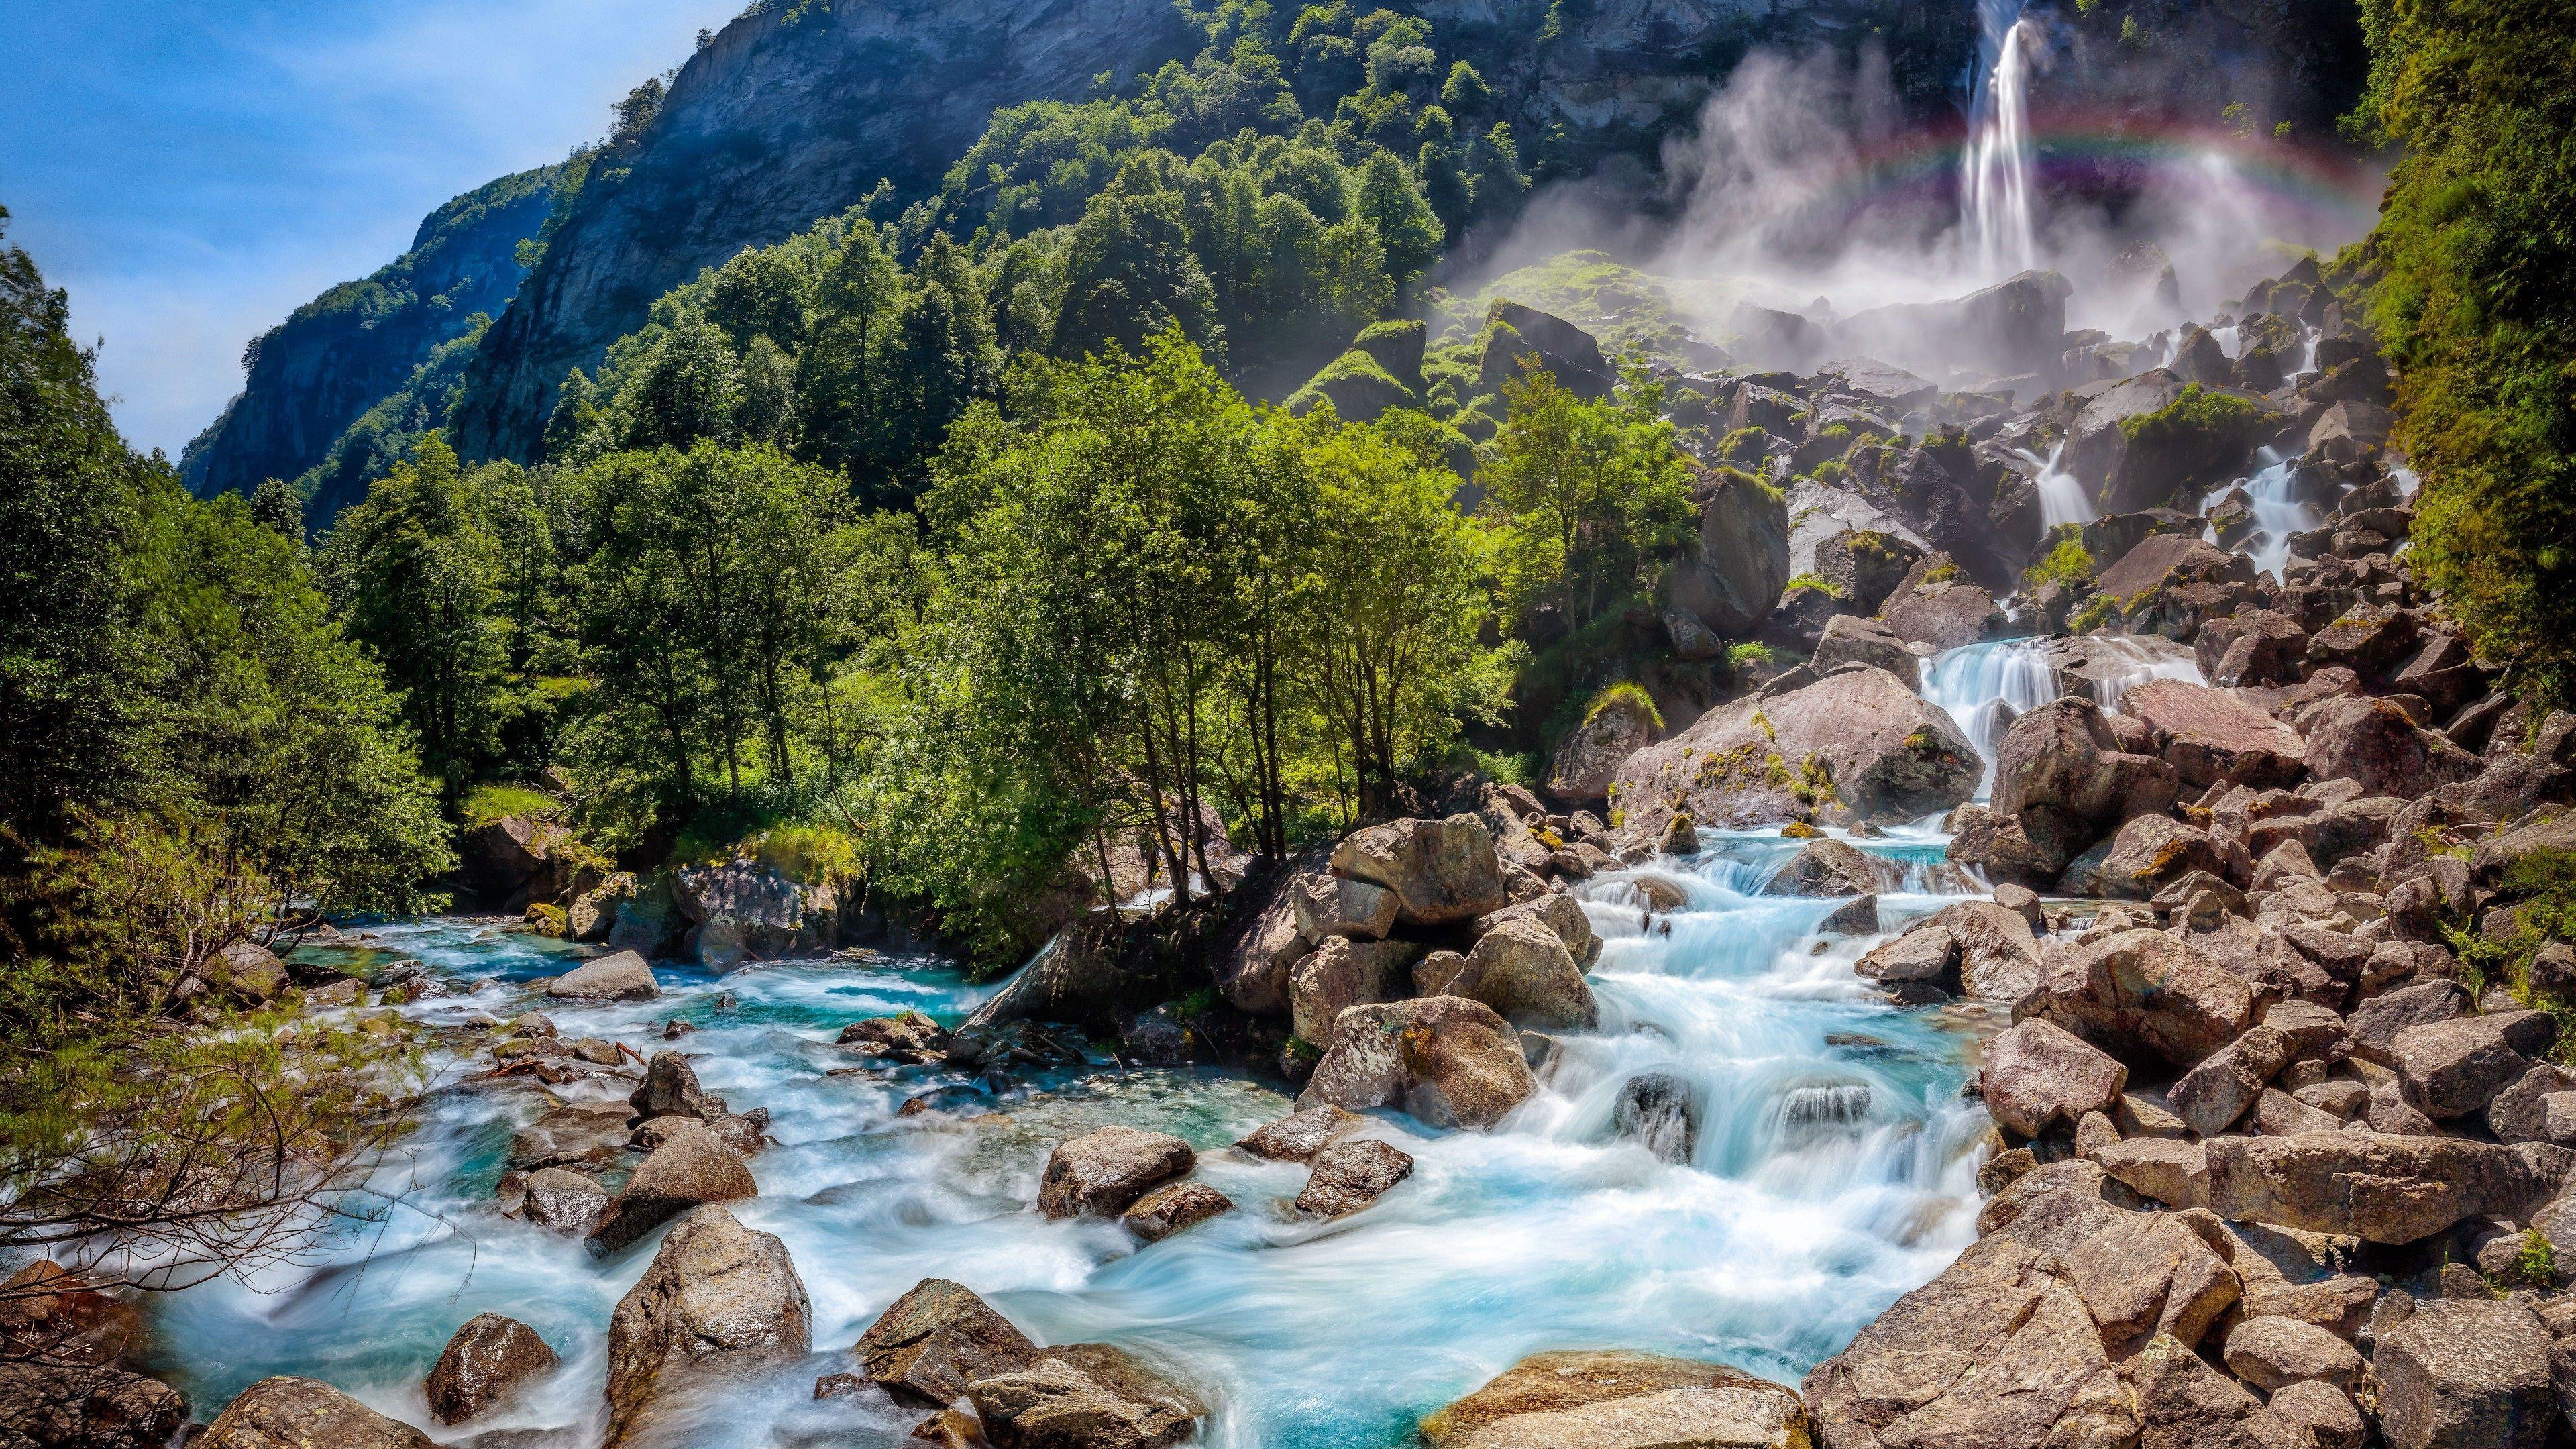 Desktop Mobile Ultra Fine Hd Quality Green Nature Waterfall Ticino Plitvice Lakes